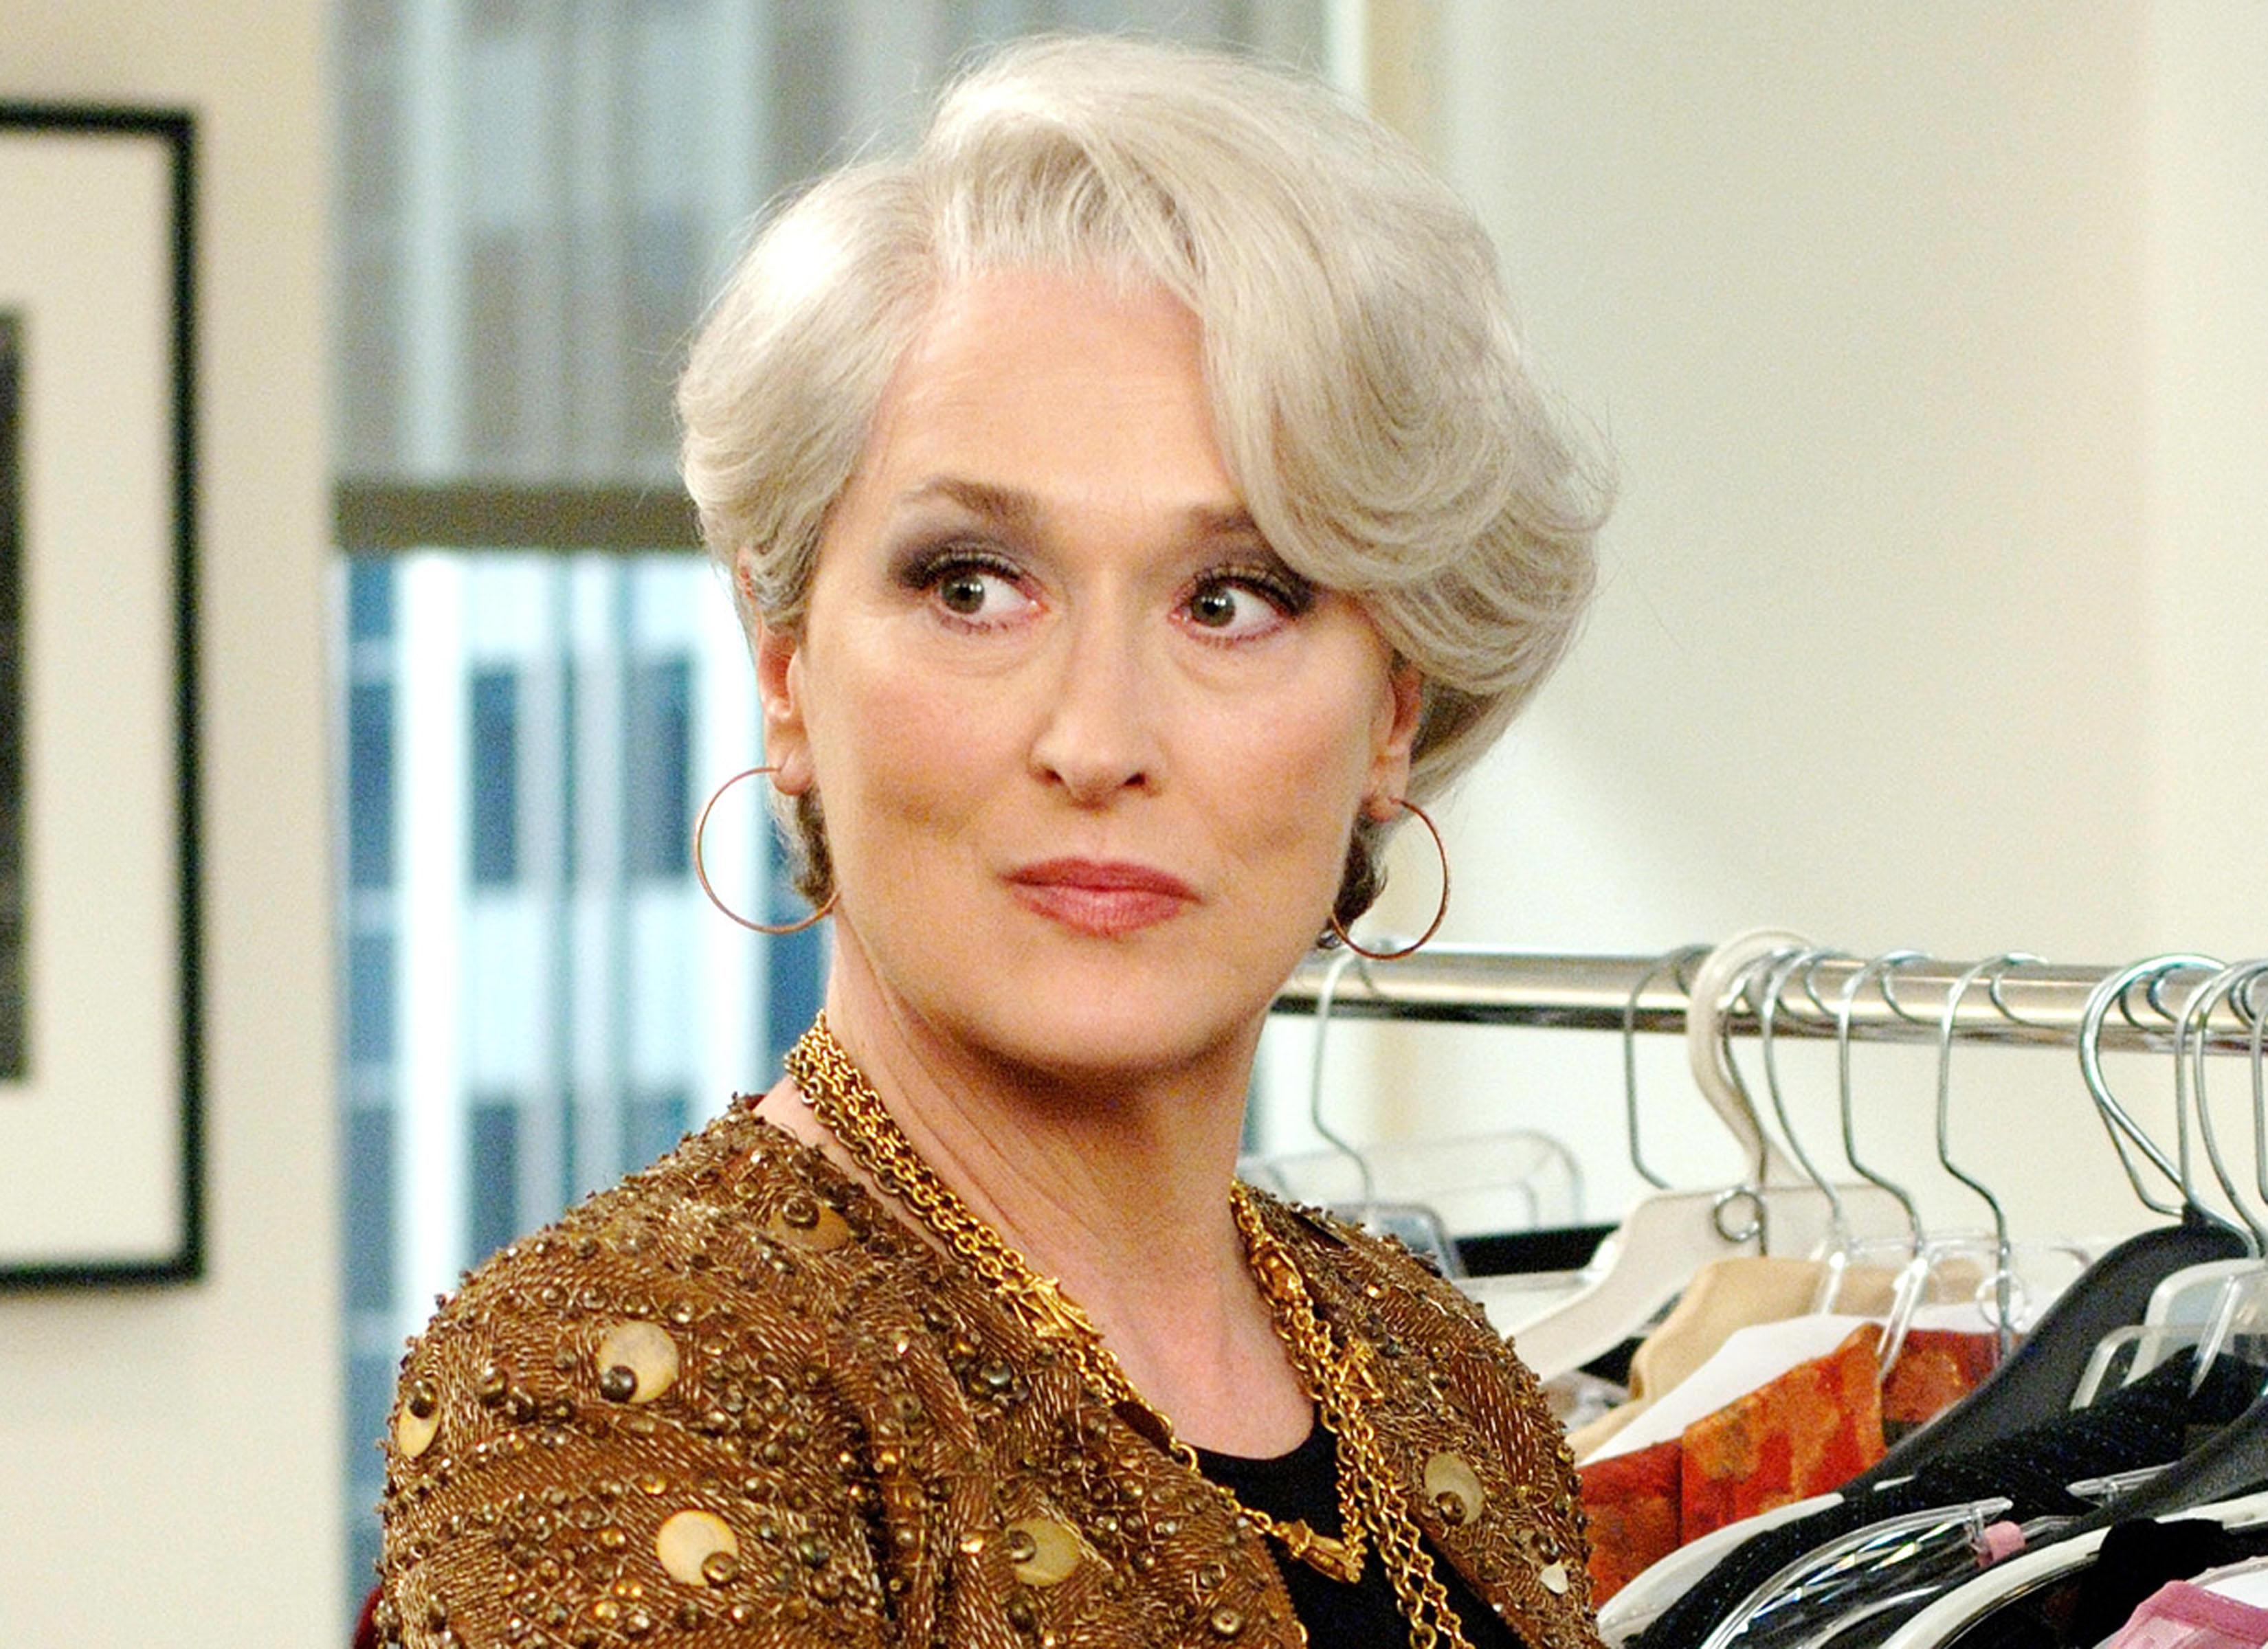 ed2cdb14a26 Coolspotting Meryl Streep